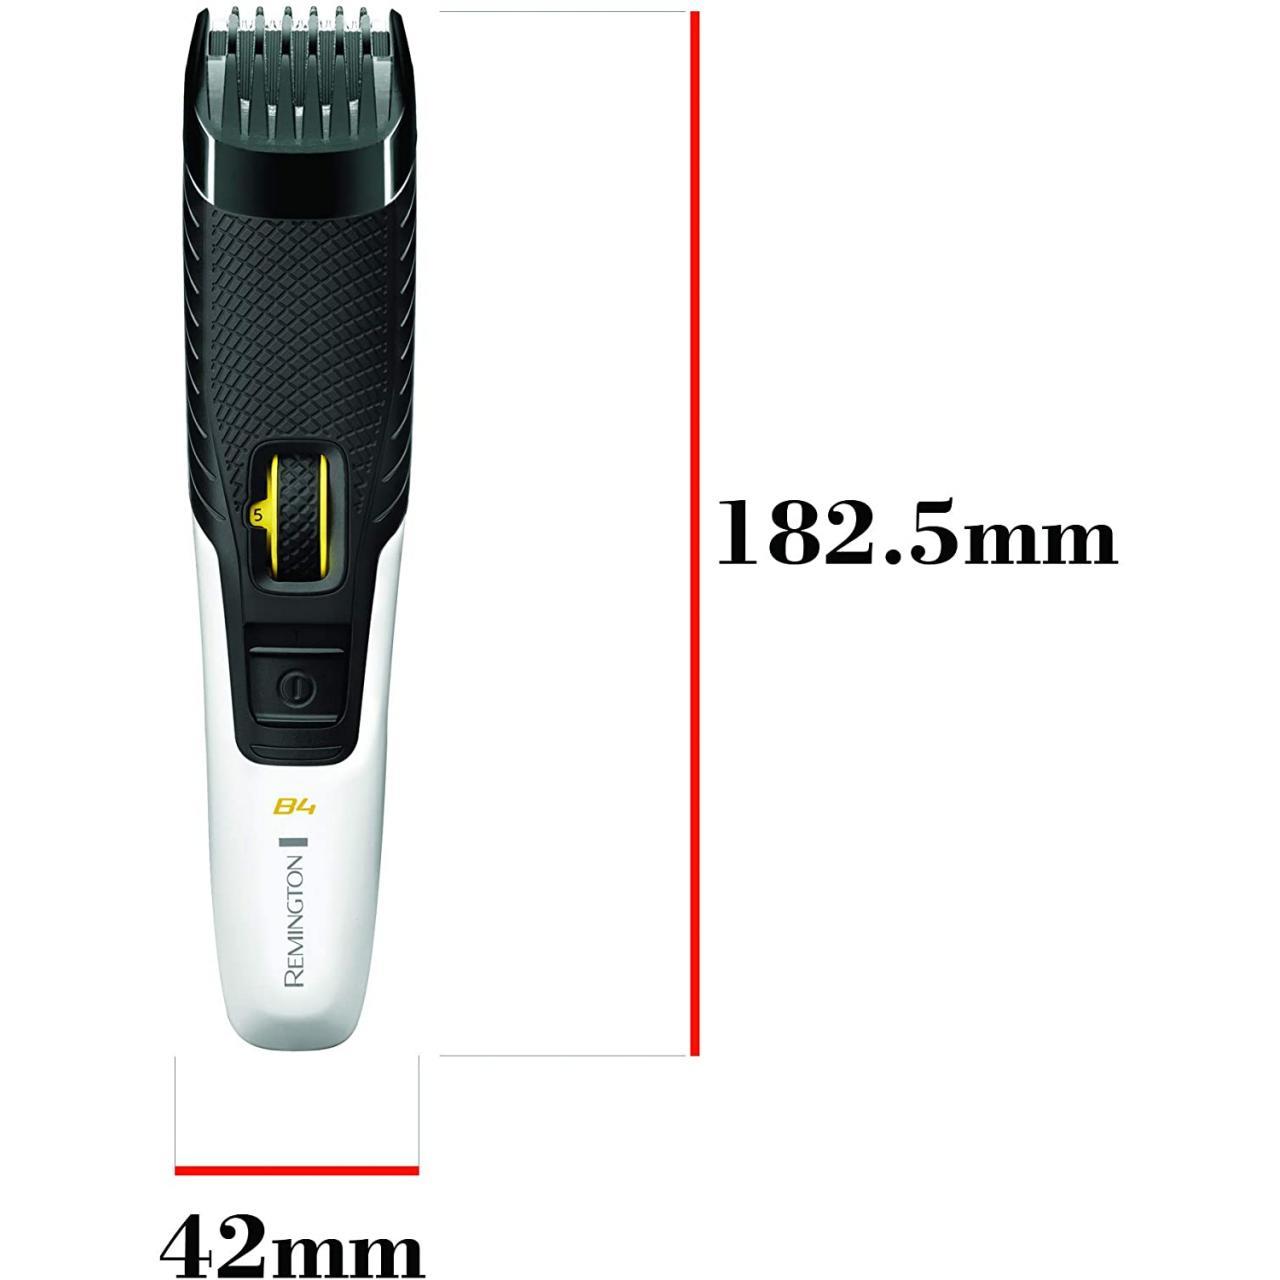 Aparat de tuns barba Style Series B4 Remington MB4000, Lame cu autoascutire, Alb/Negru